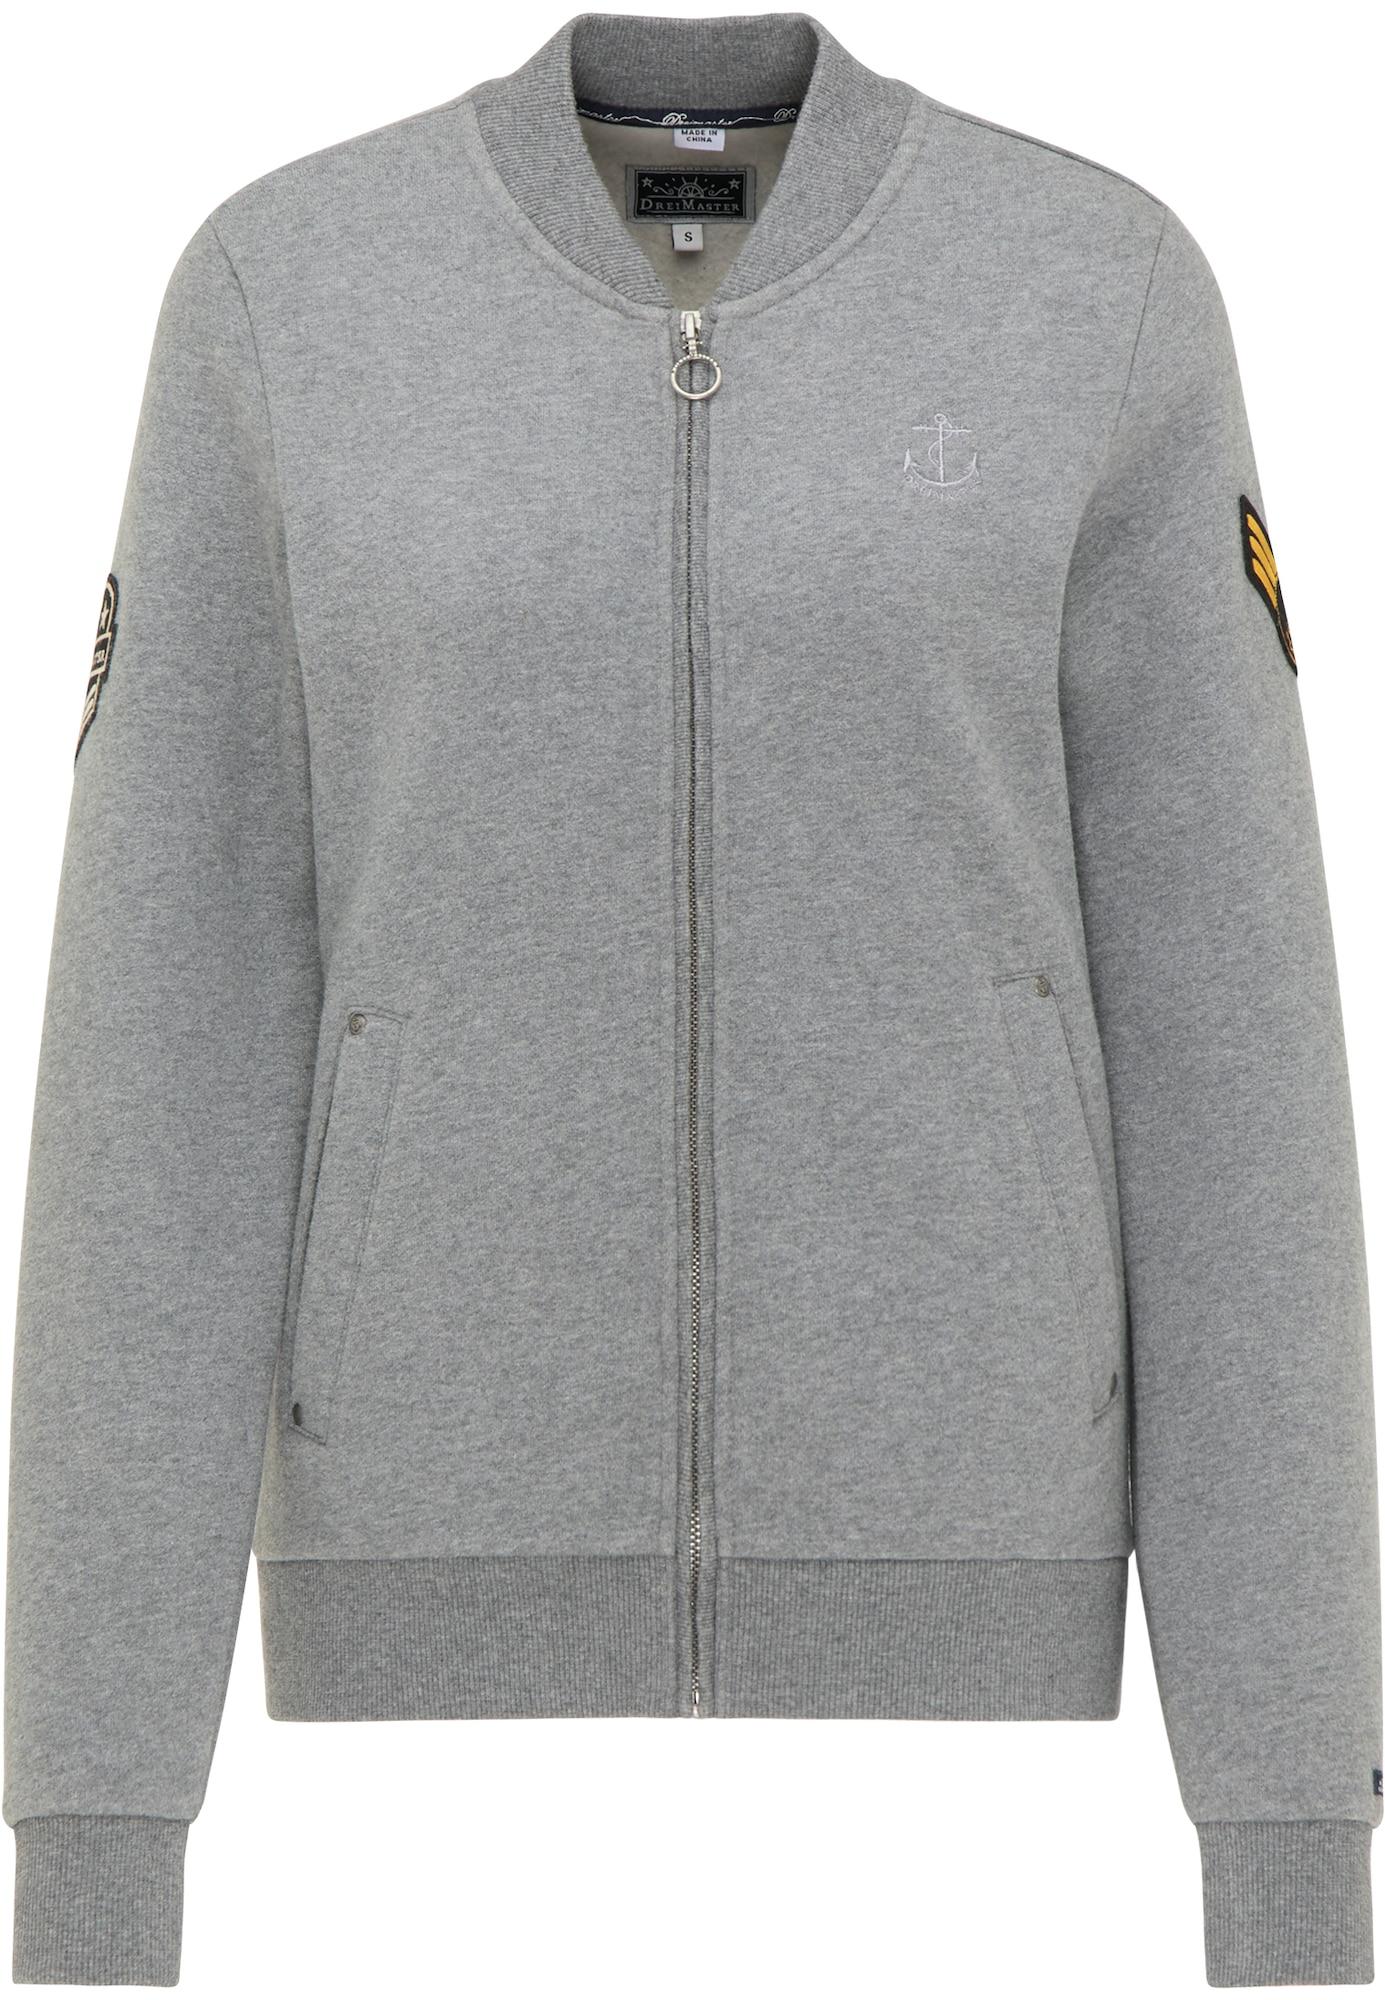 DreiMaster Maritim Džemperis margai pilka / juoda / aukso geltonumo spalva